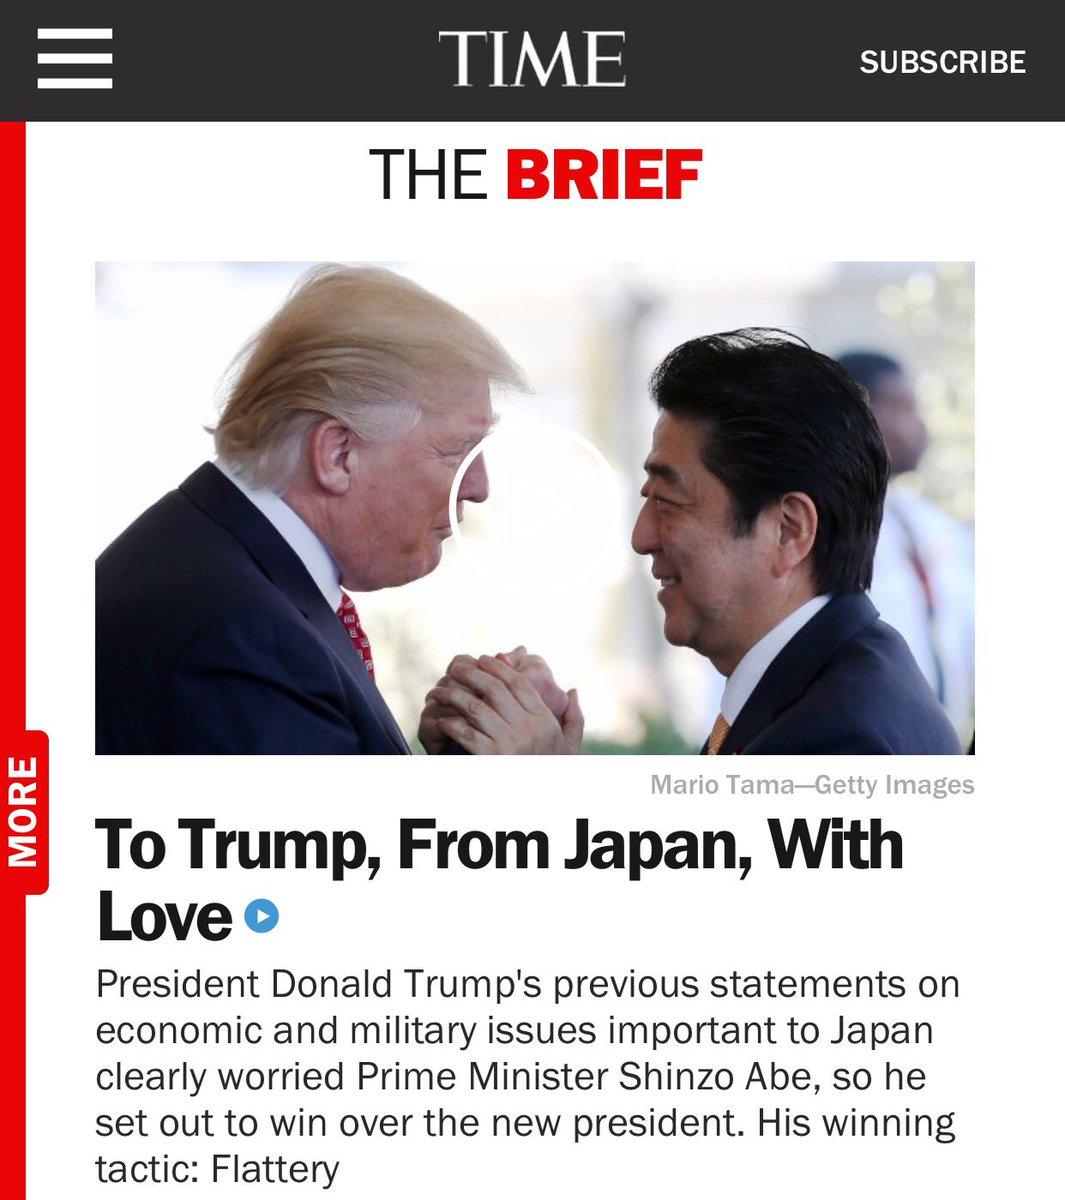 TIMEのこの見出しも凄いよ。 『日本より愛をこめて』  映画の邦題みたいだ。日本の総理大臣は全世界…